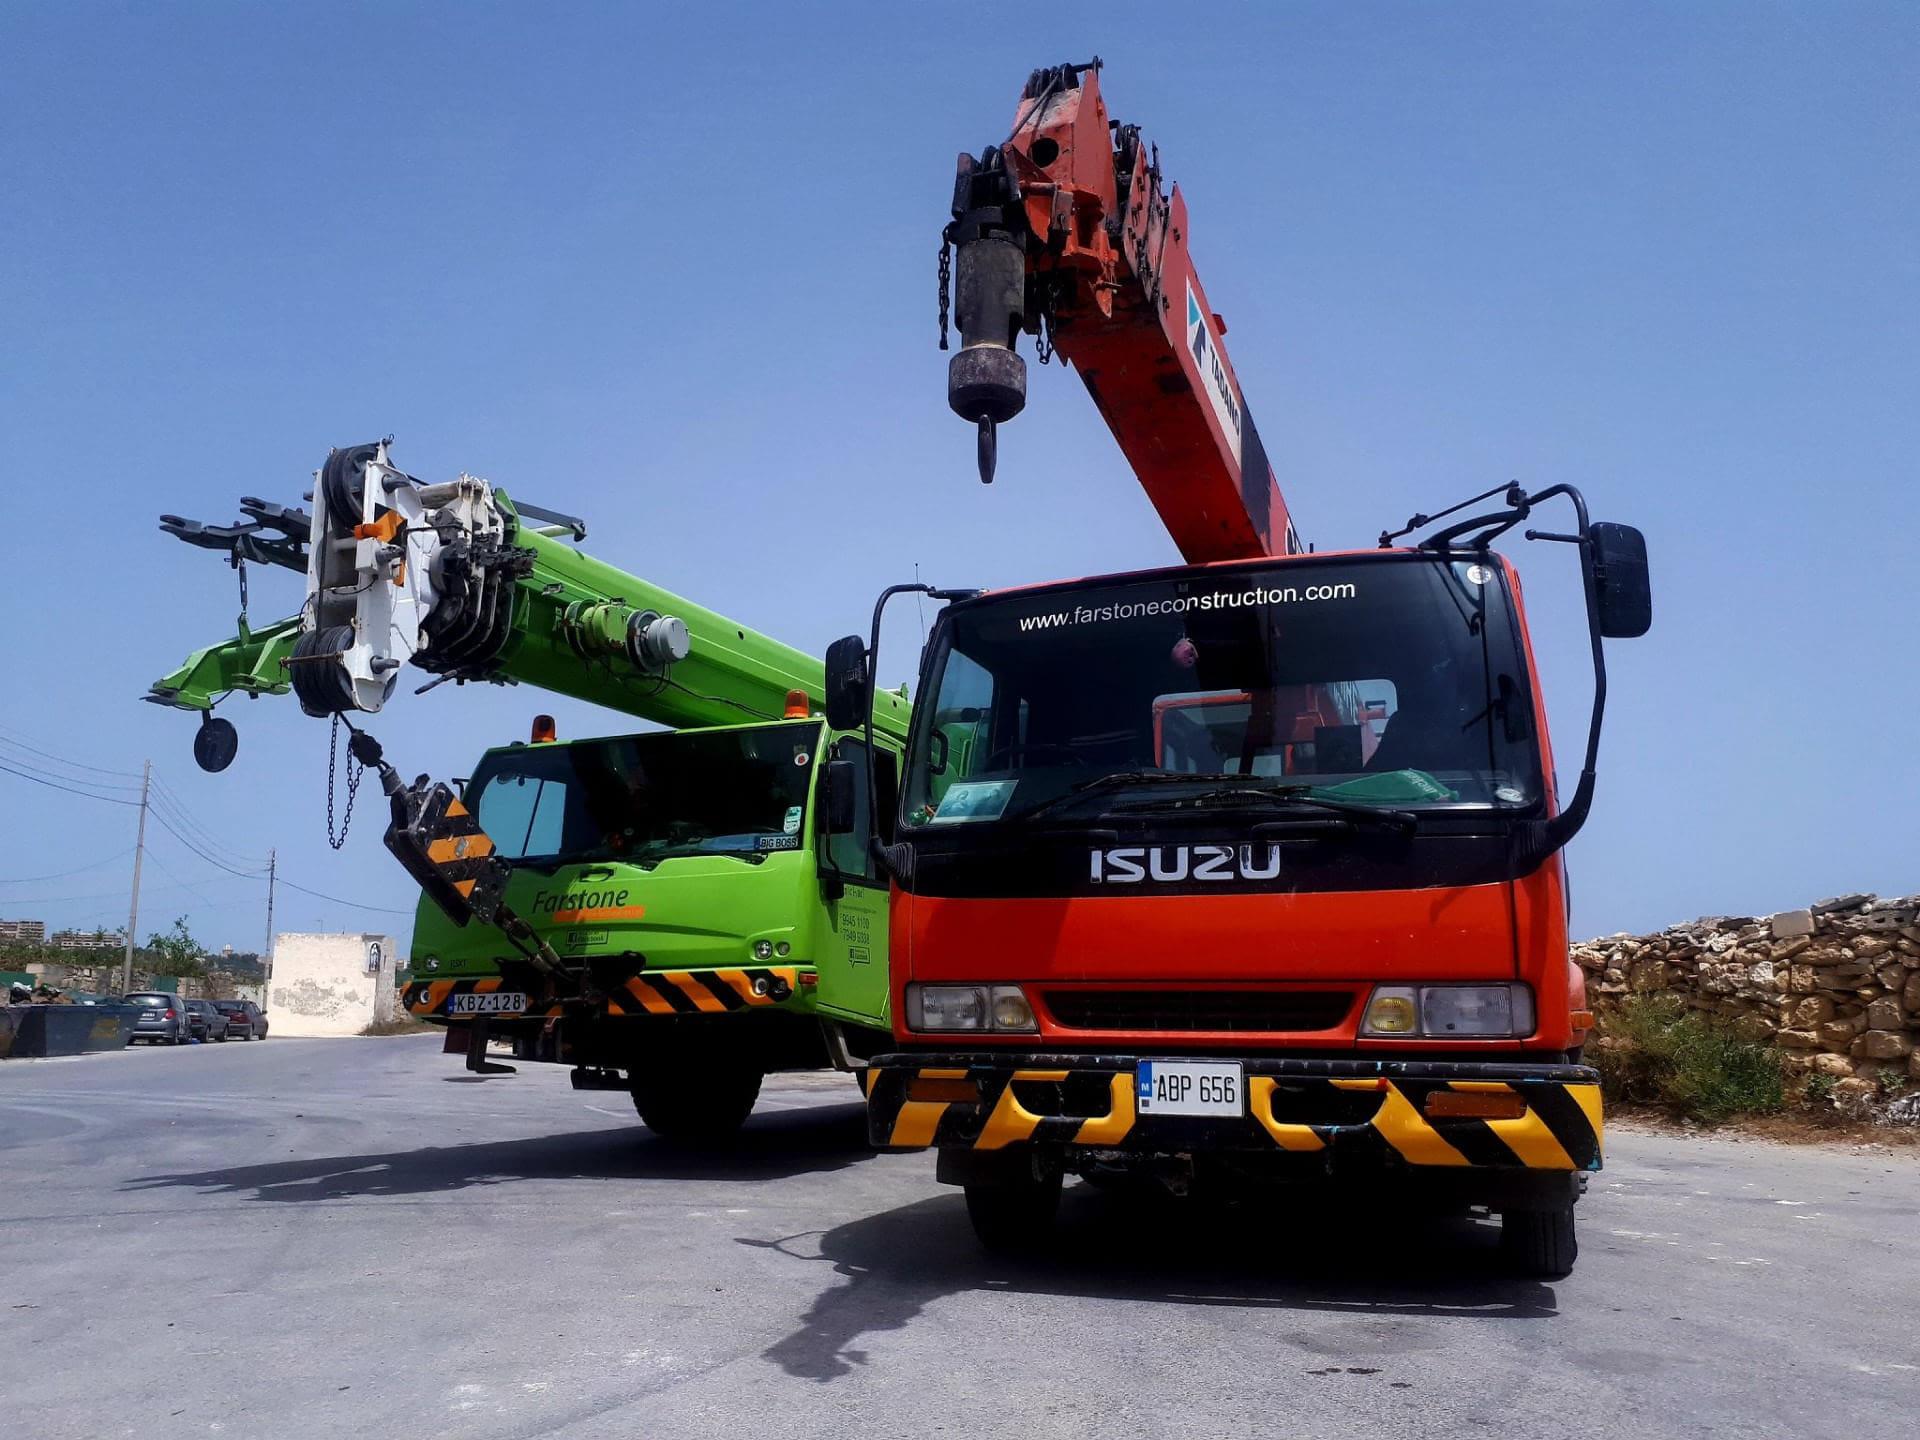 Abp 656 farstone construction & restoration ltd - crane & hoist hire